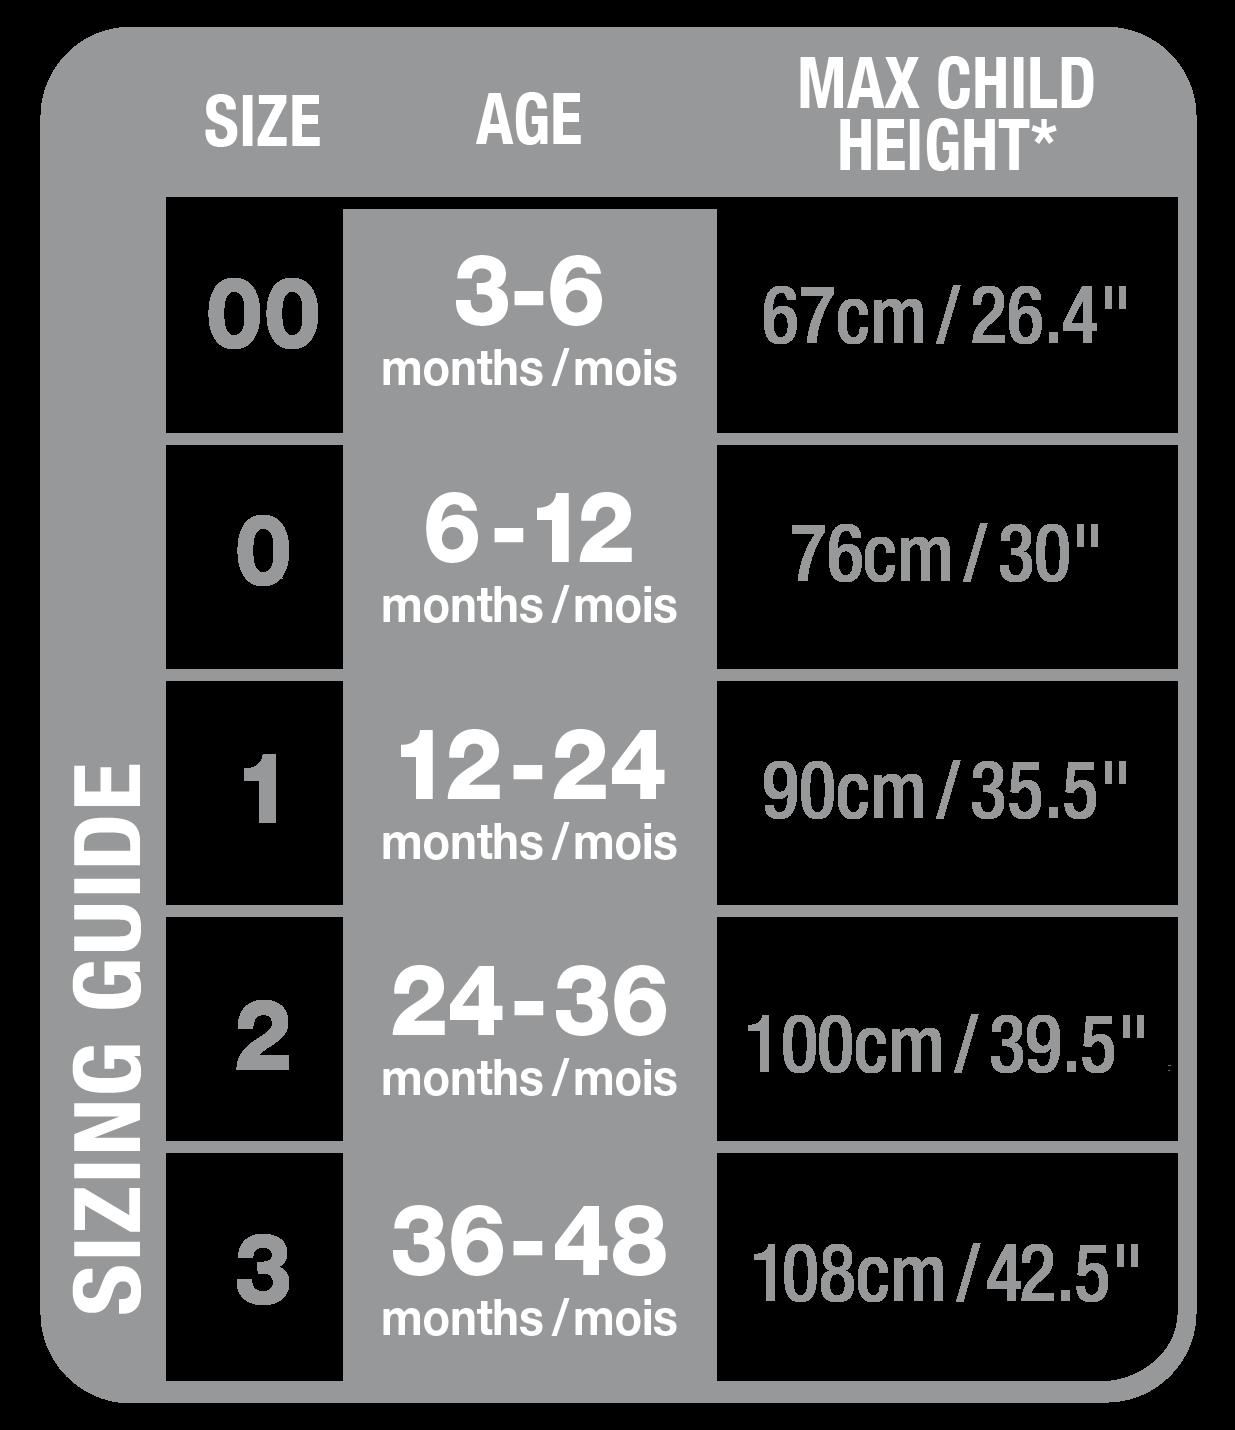 sls-size-chart-resize.png